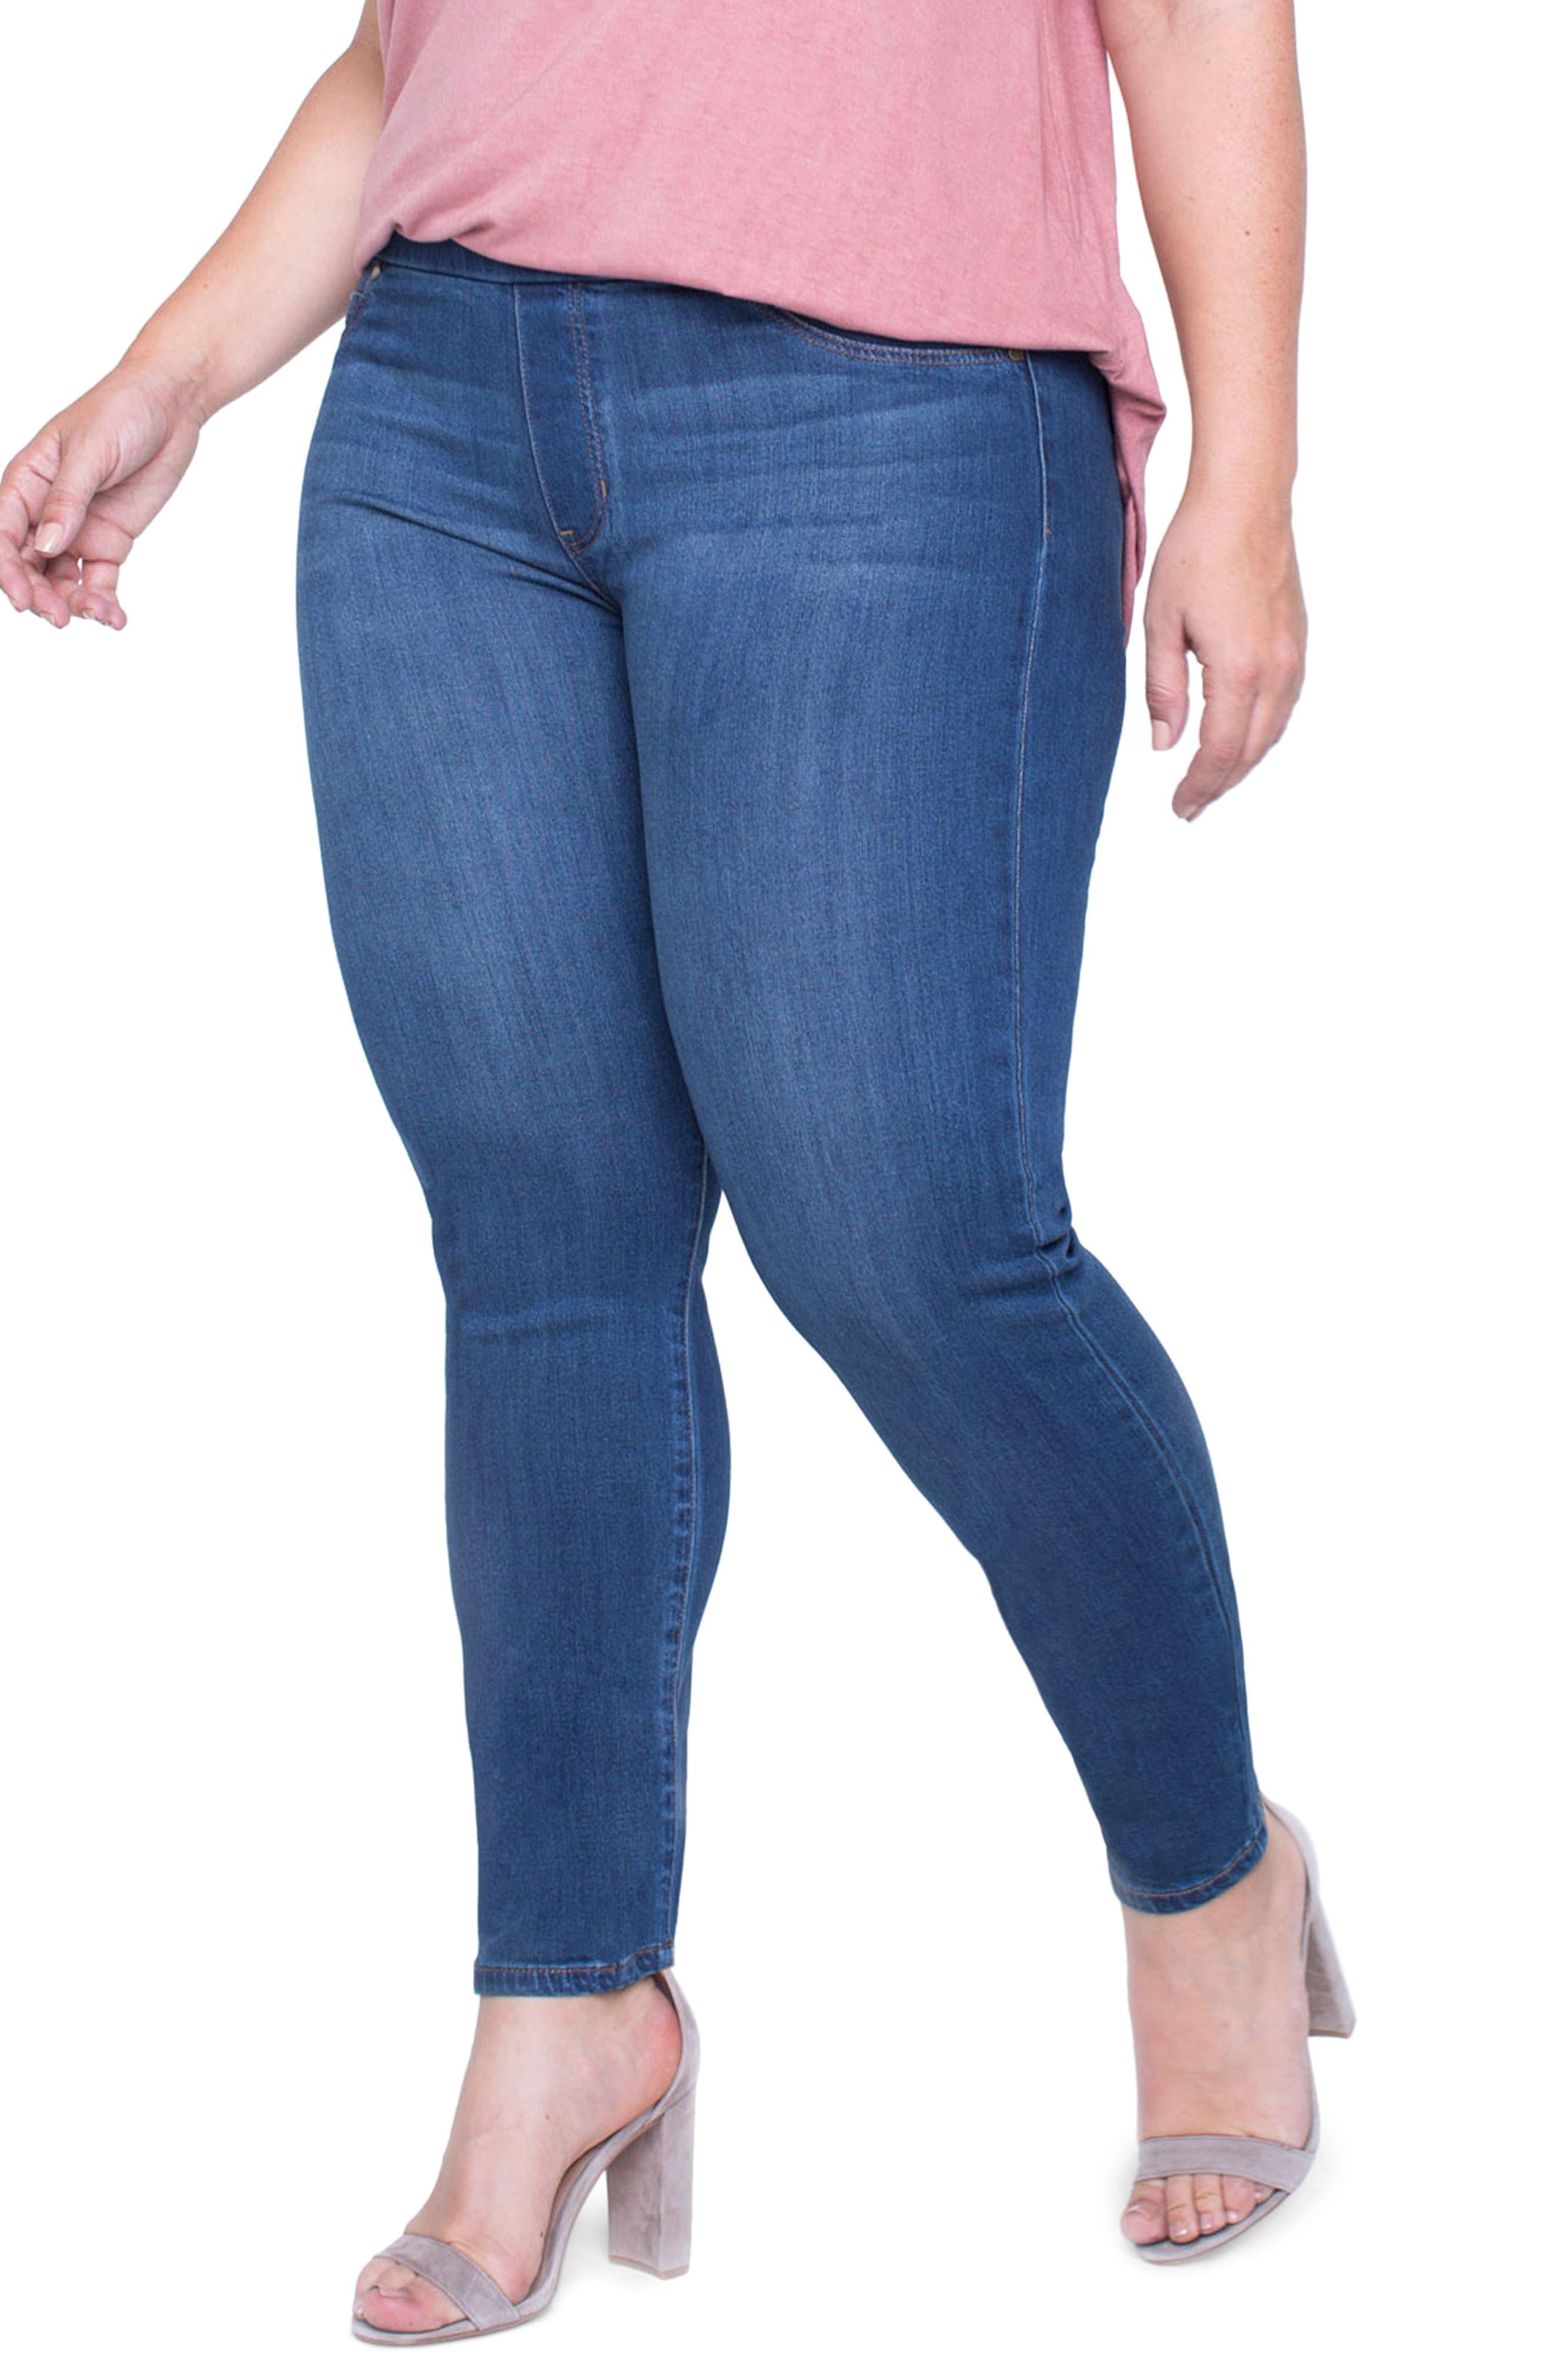 Jeans Company Sienna Mid Rise Soft Stretch Denim Leggings,                             Alternate thumbnail 11, color,